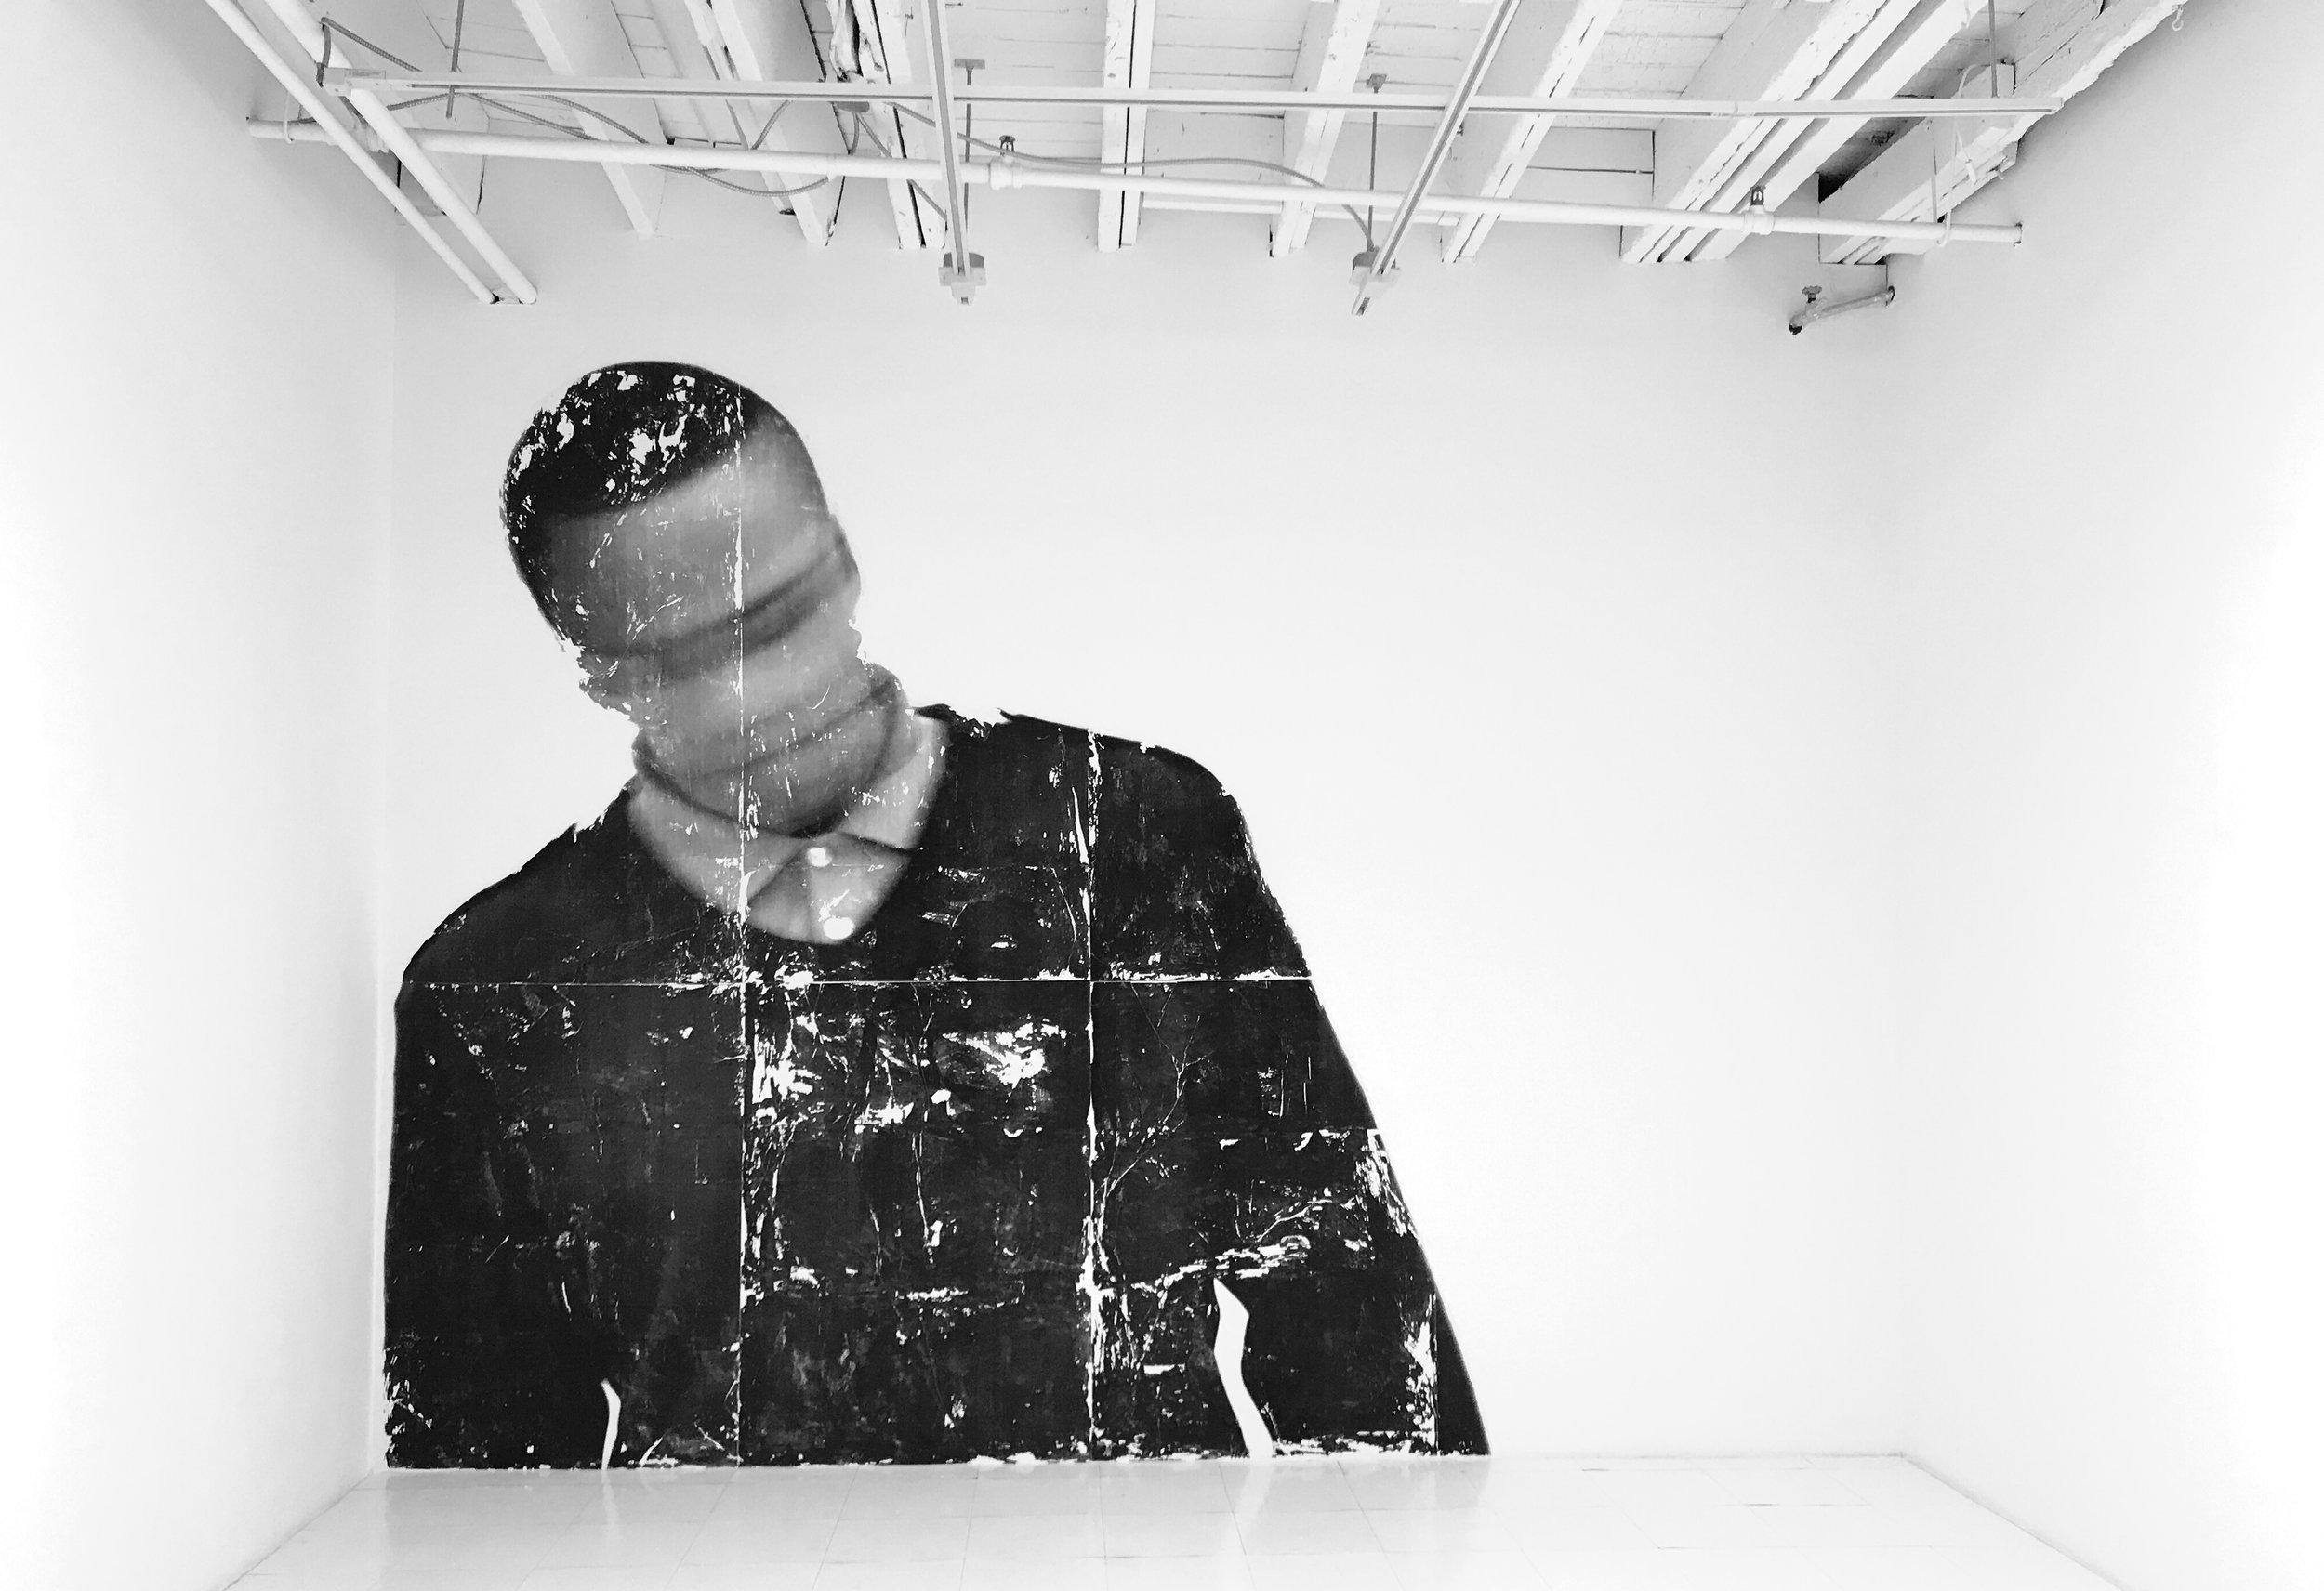 Blur 8 , 2017, mural, photo-based gel transfer media, paper, installation at Georgia Scherman Projects